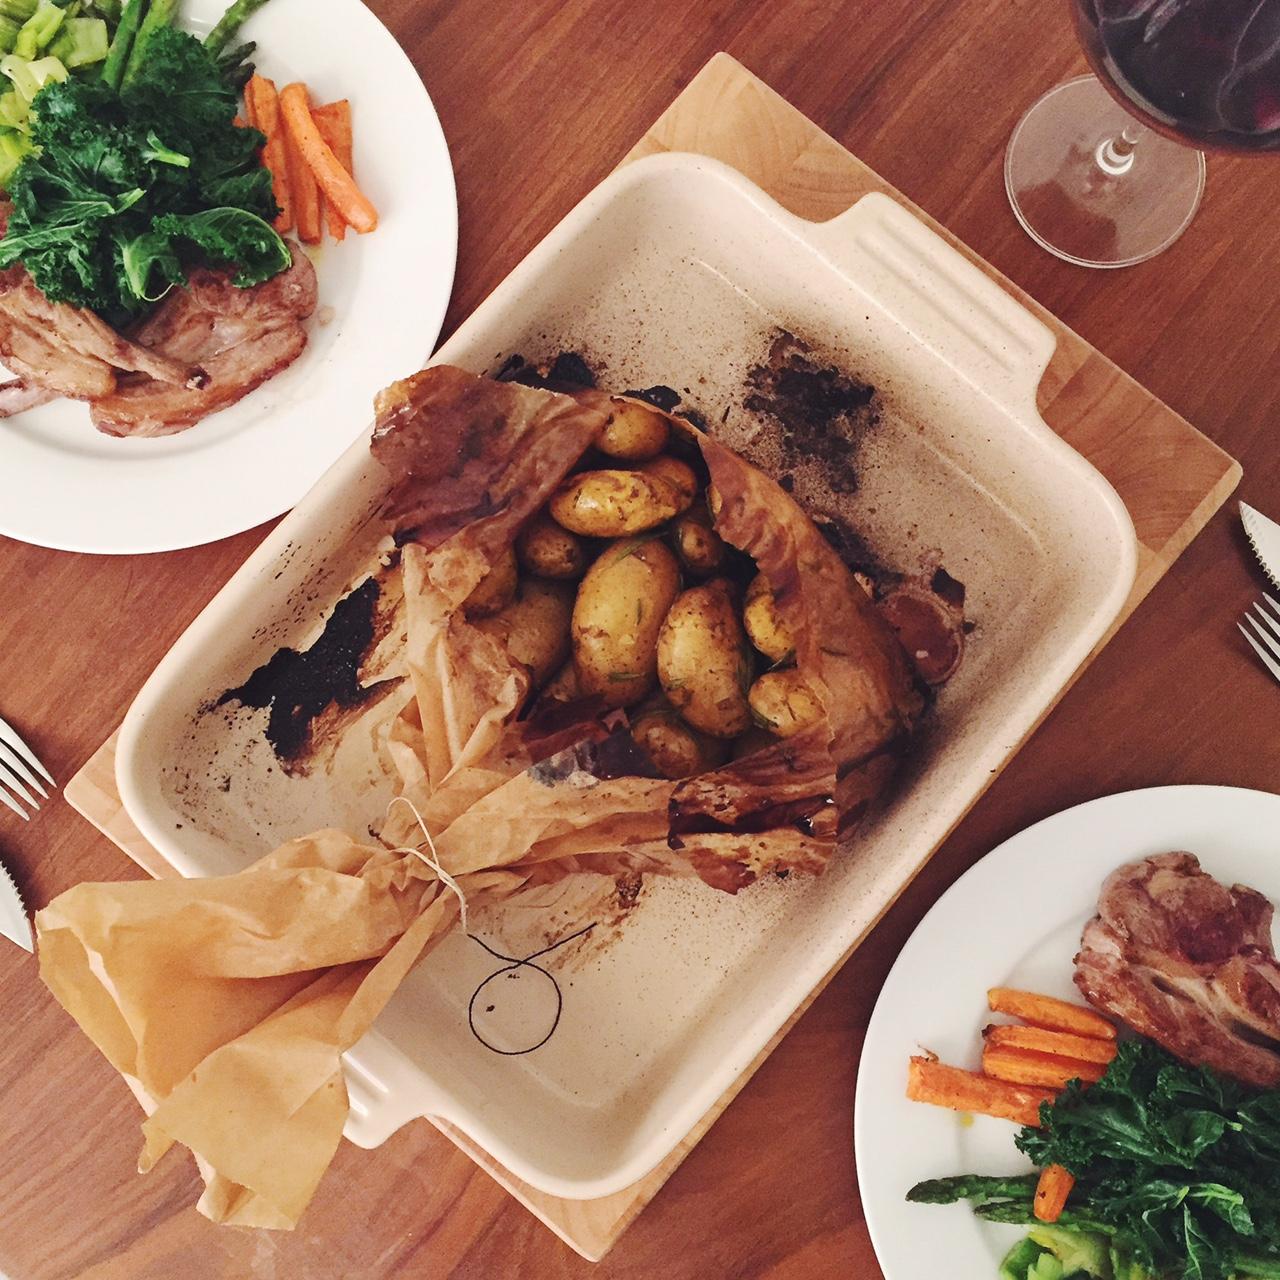 Jimmy Doherty's salt and vinegar potatoes recipe